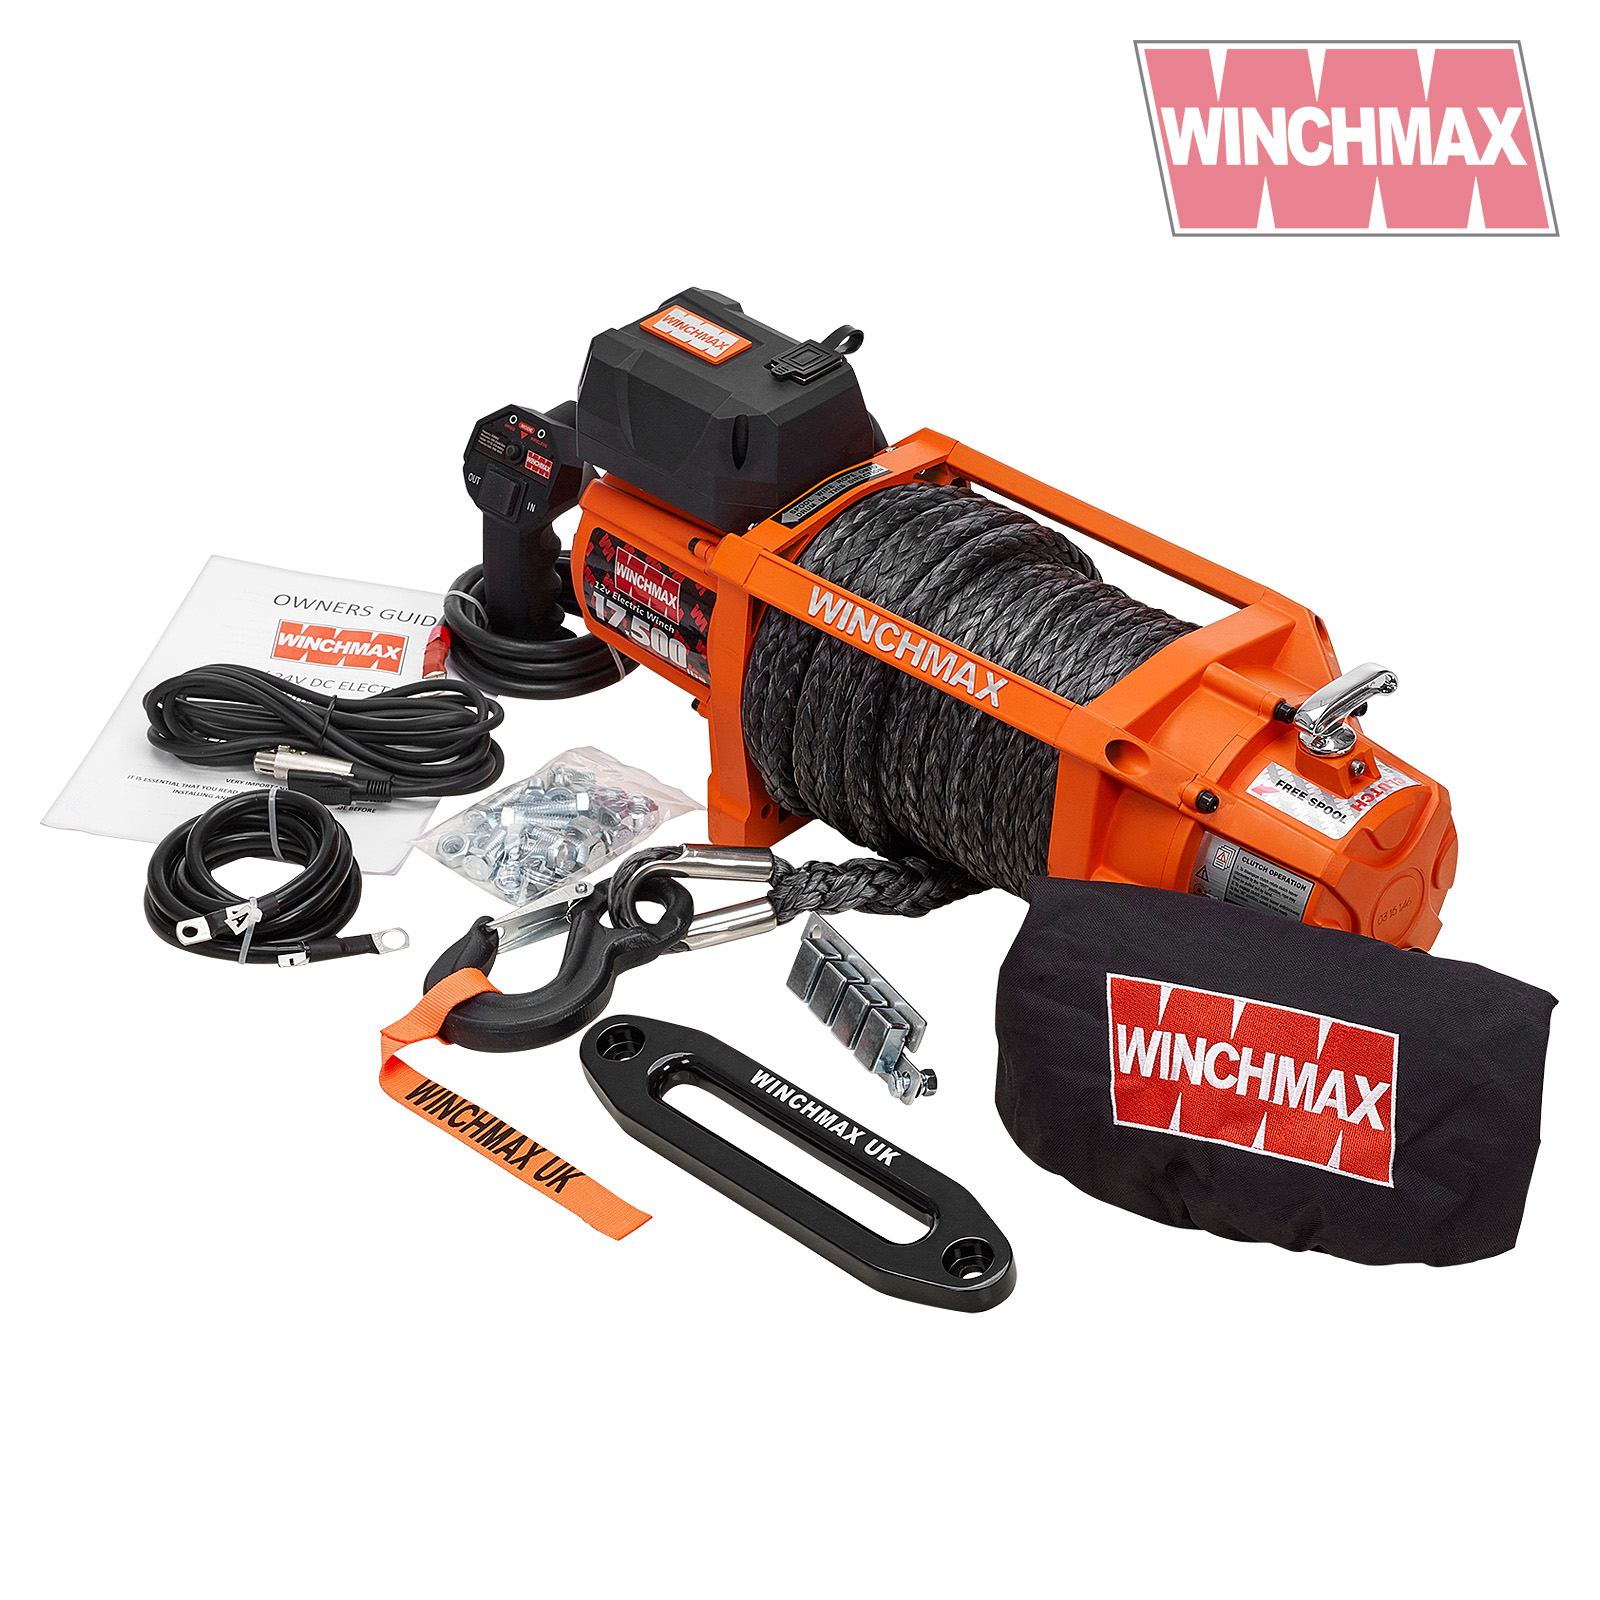 Wmsl1750012vsyn winchmax6.15198967 white 05